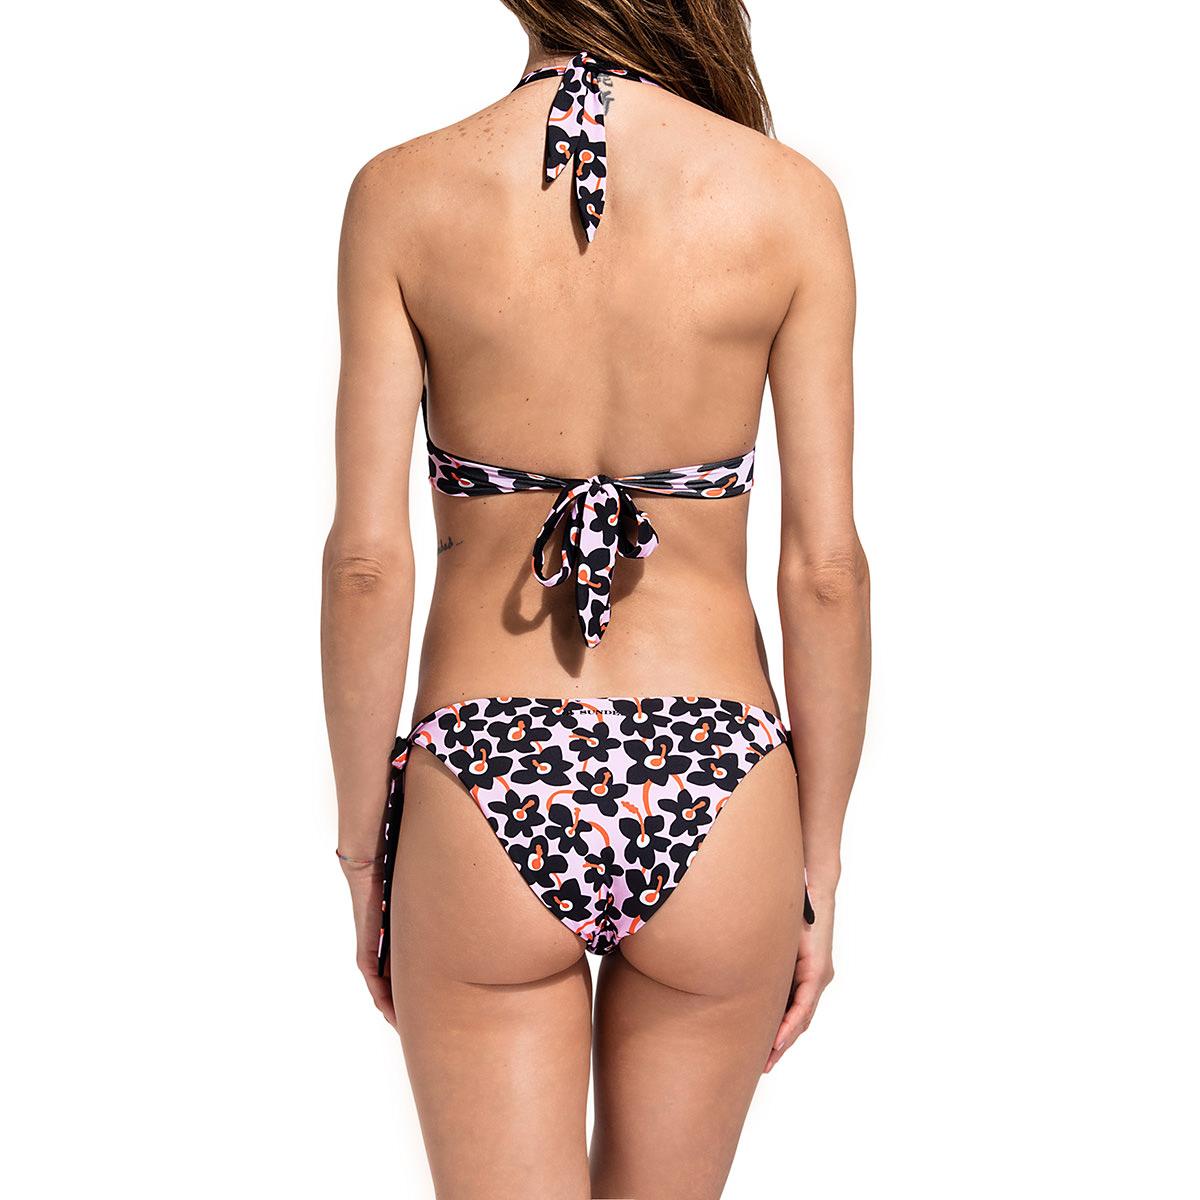 10 year old girl in bikini swimsuit